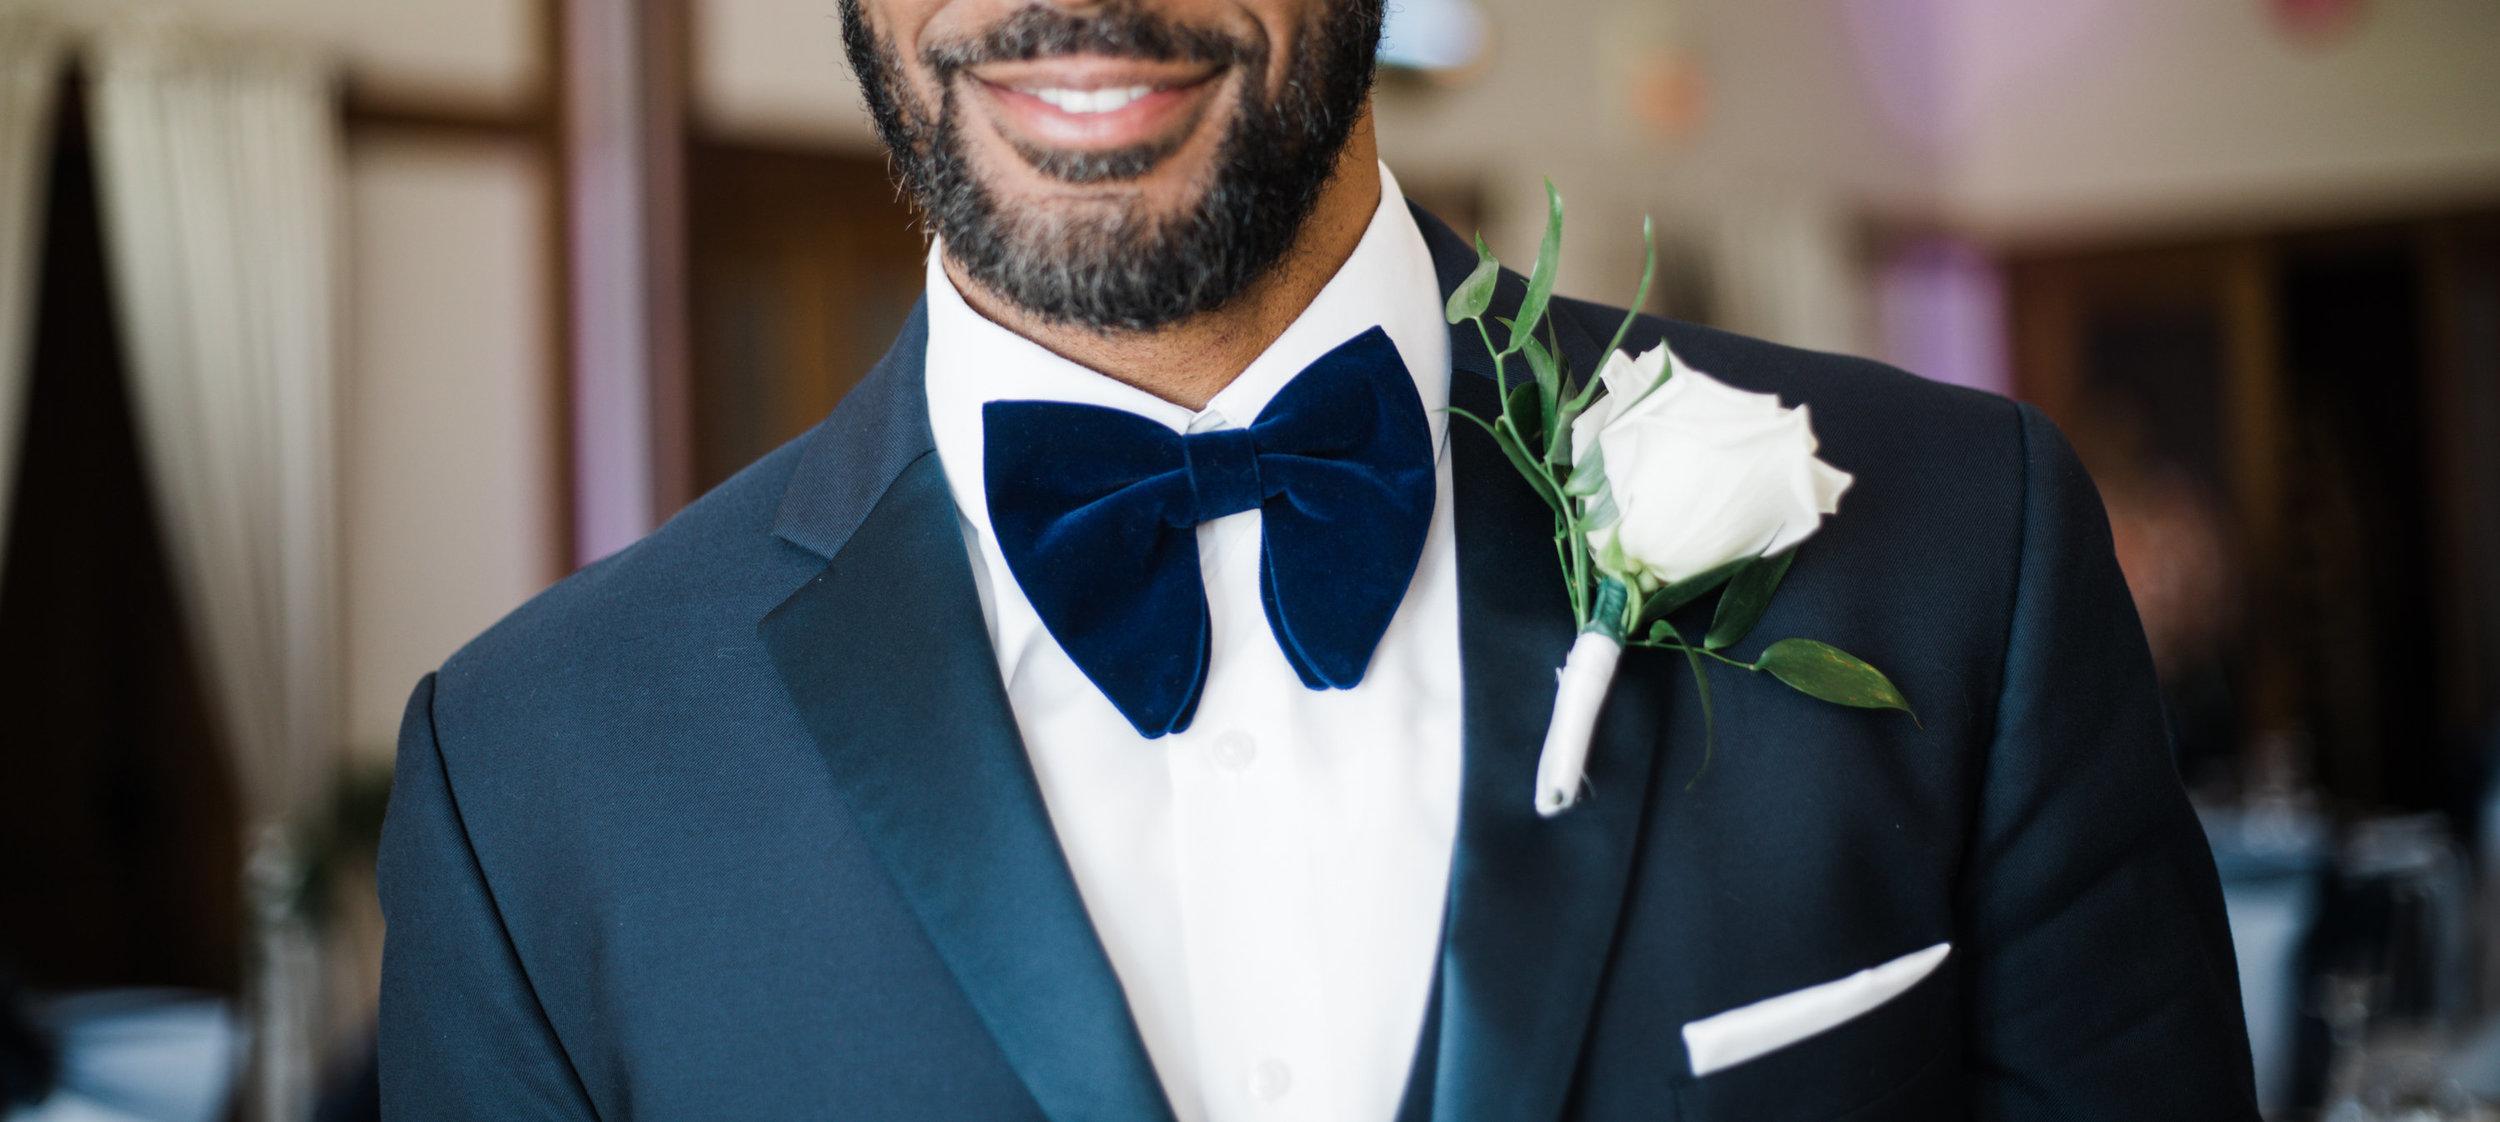 Best Montgomery County Wedding Photographer Megapixels Media black groom style.jpg